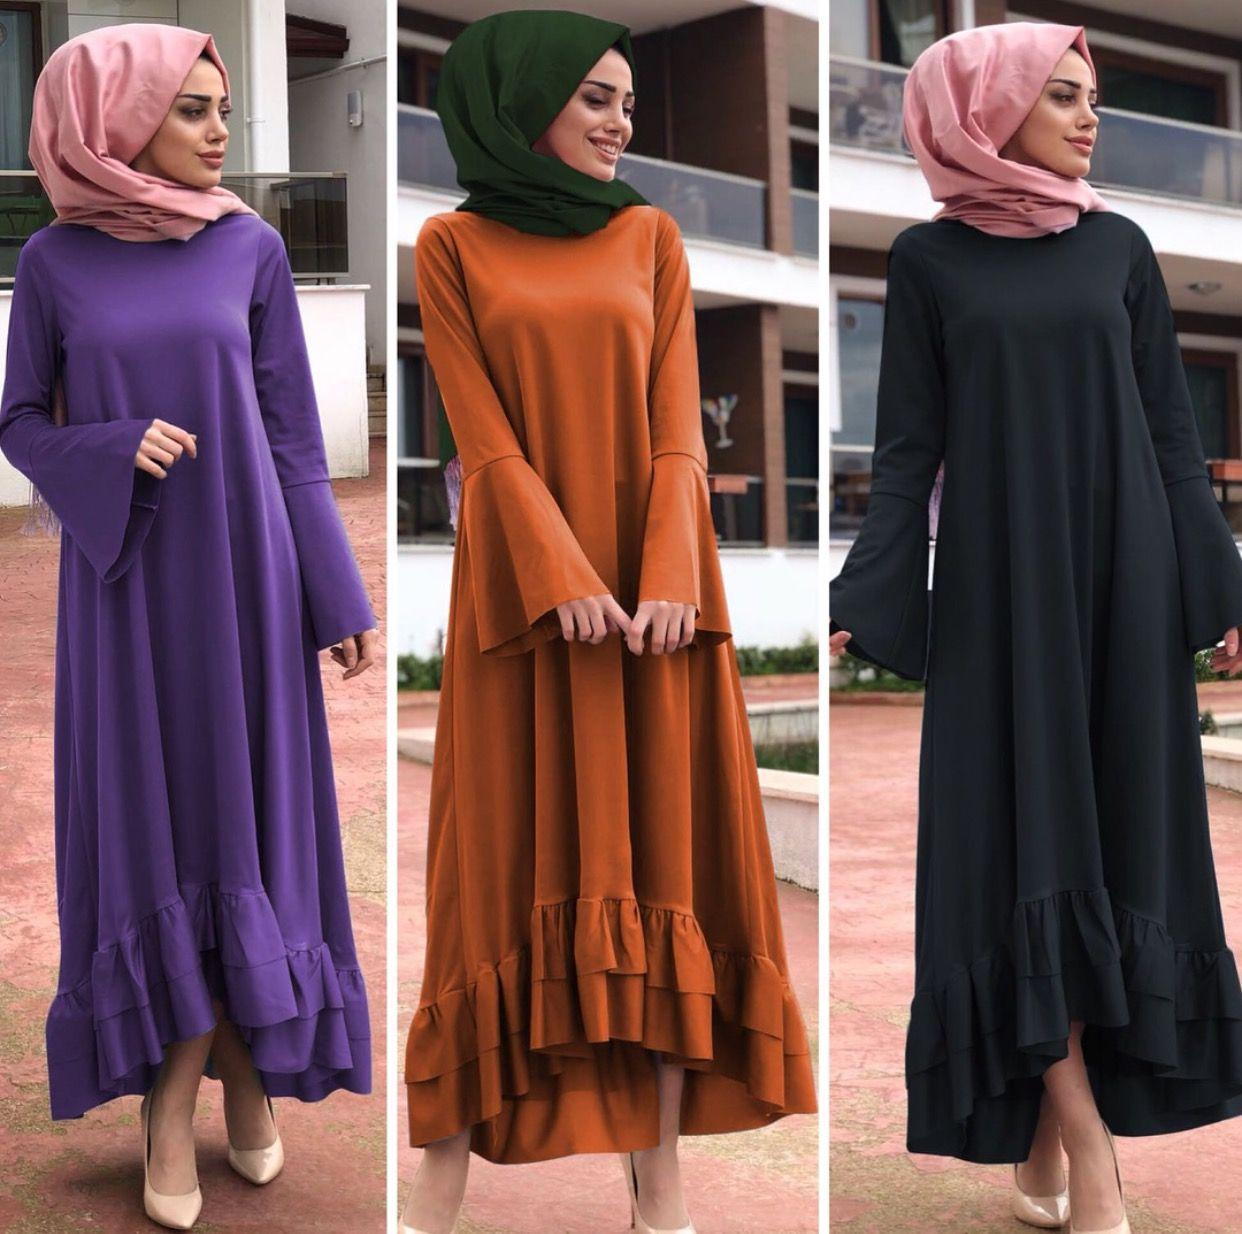 614d10b58aeff IG: semraboutique   giyim   Elbiseler, Türban kıyafetler und Kıyafet